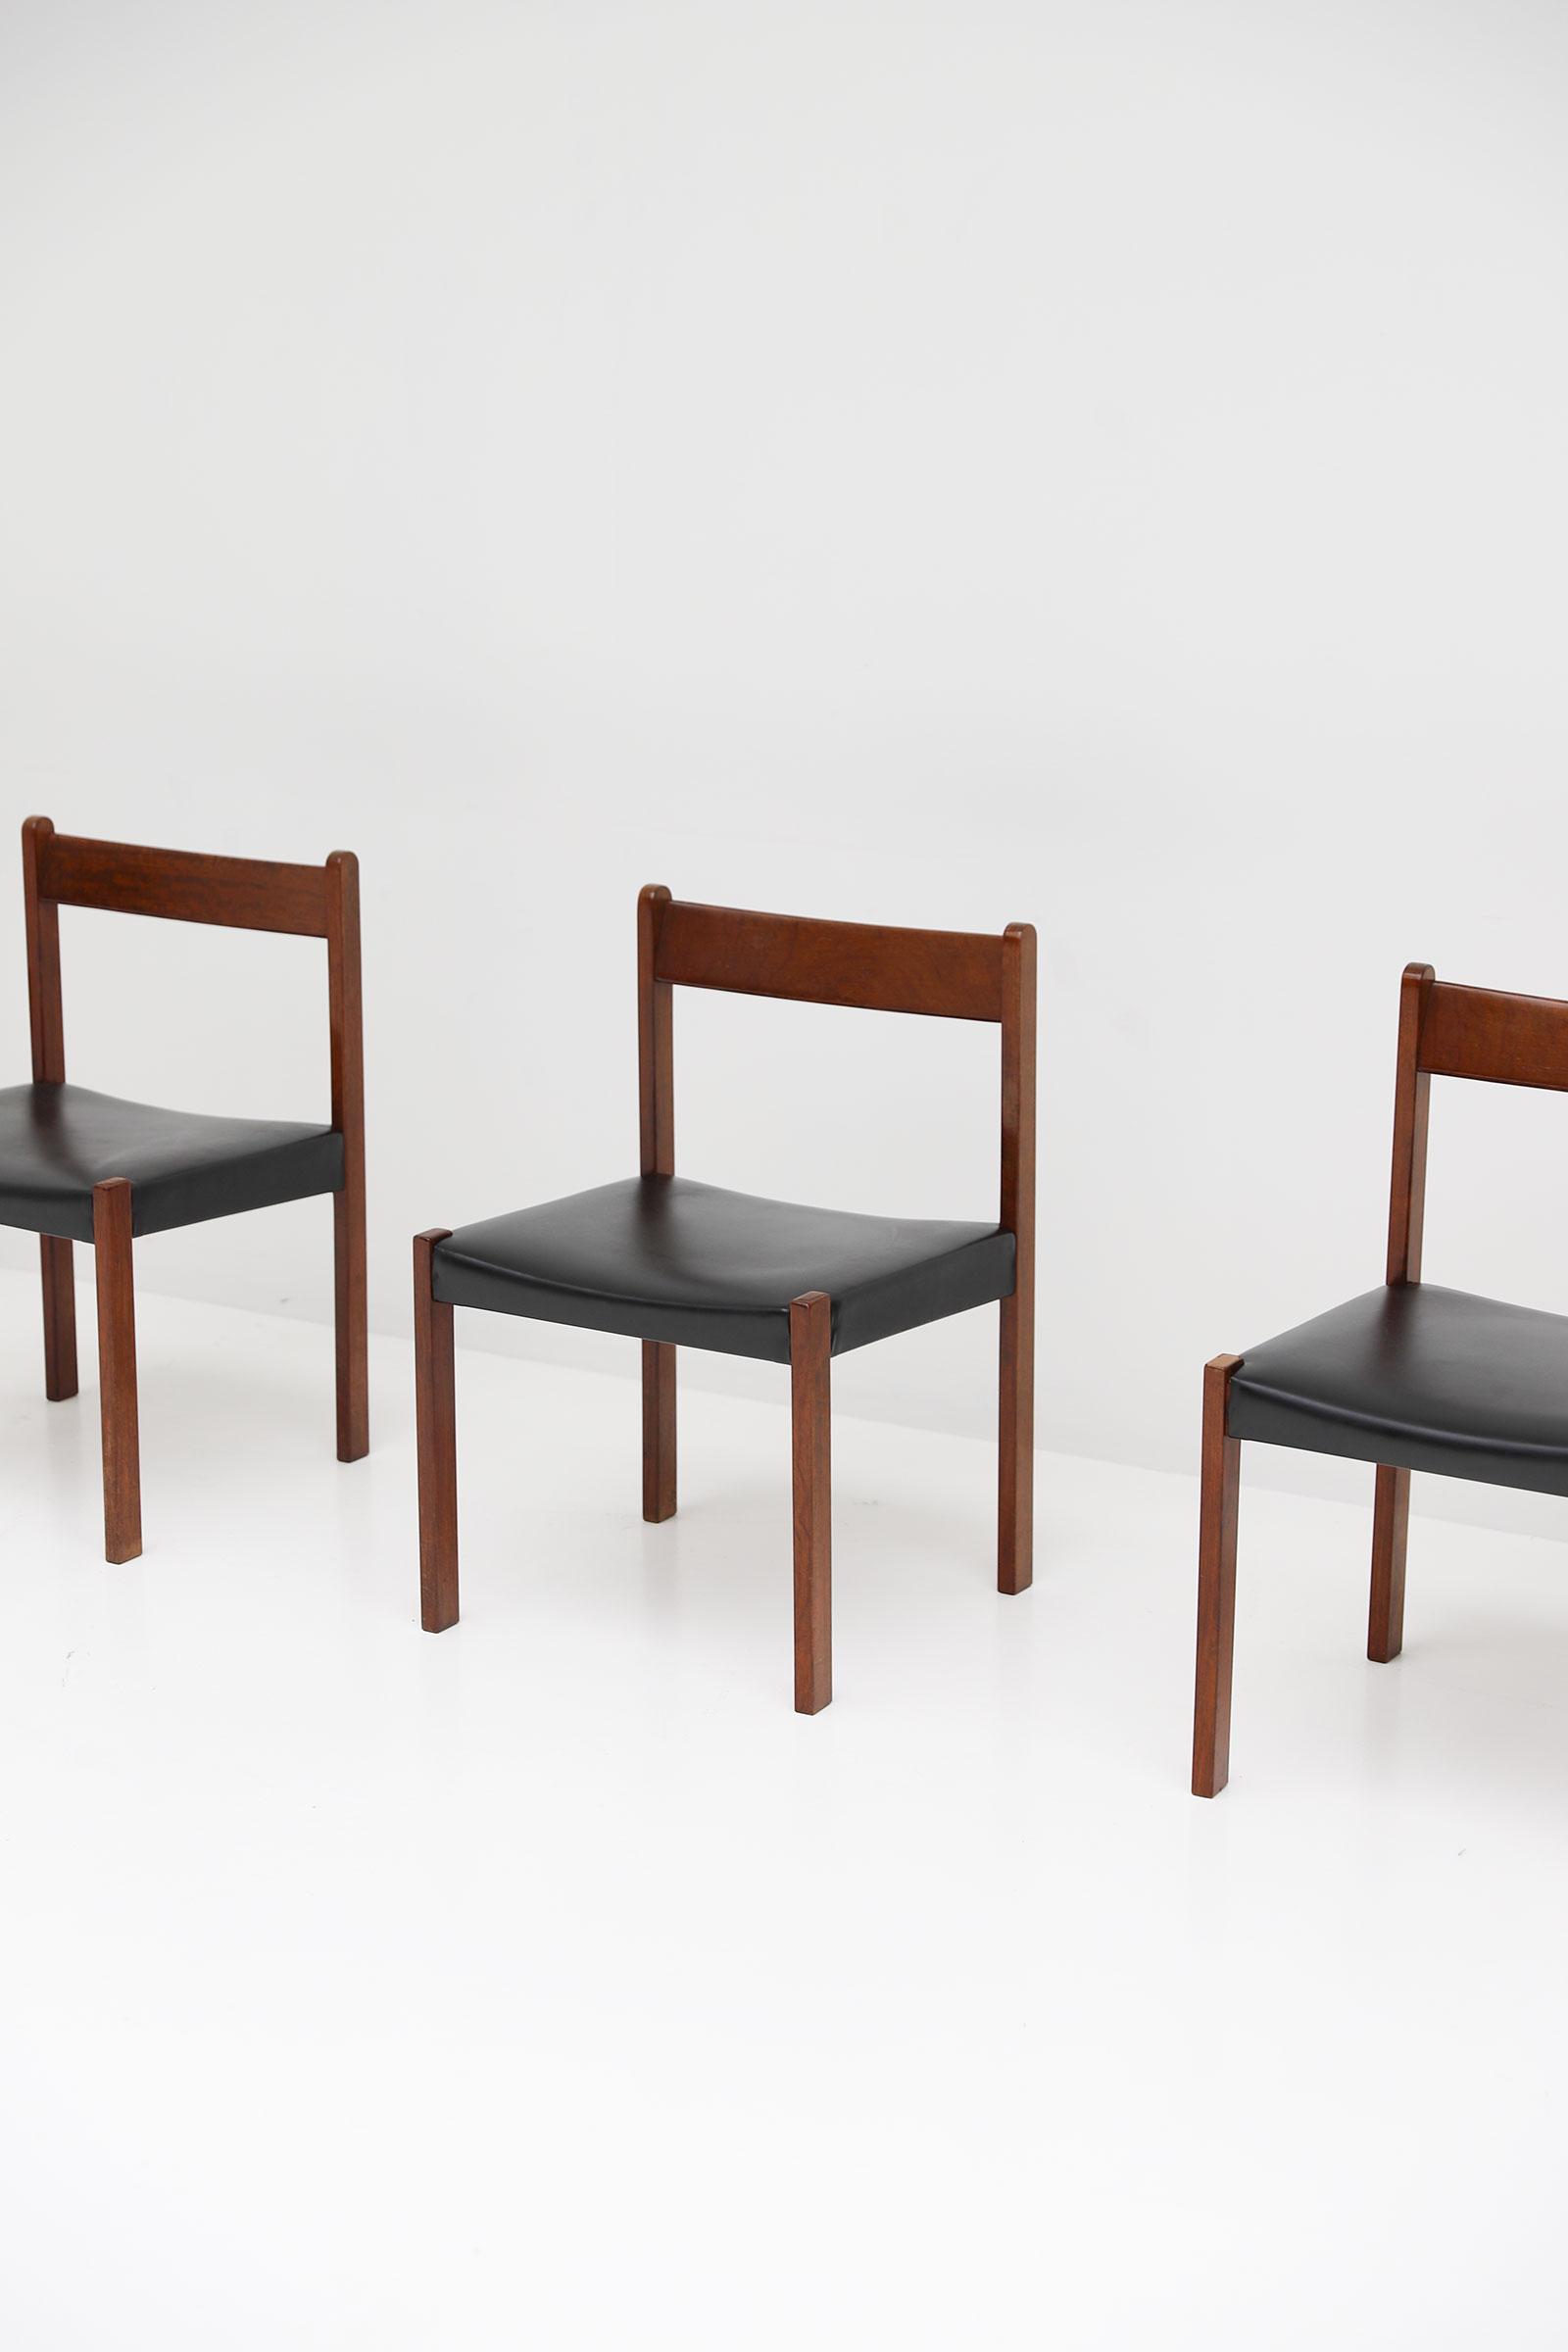 Alfred Hendrickx Belform Chairsimage 3